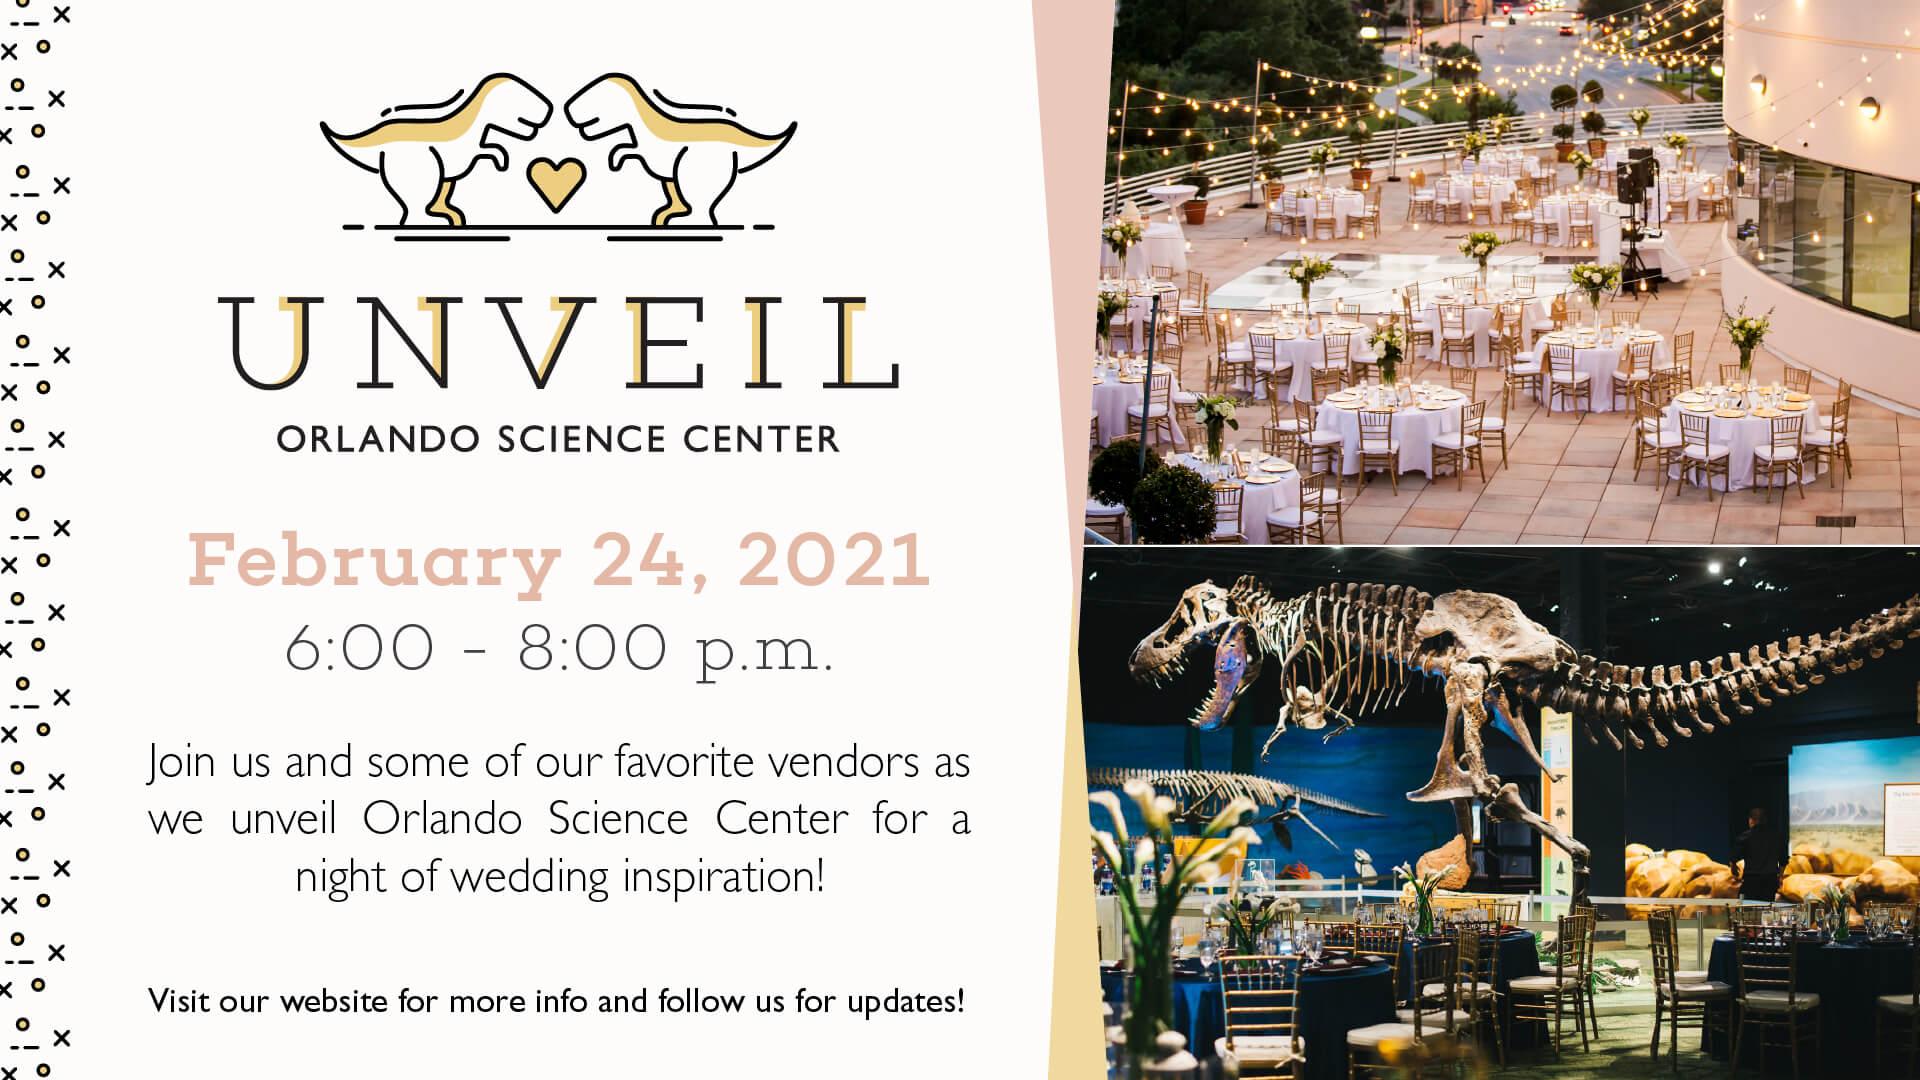 Unveil Wedding Showcase - February 24, 2021, 6:00 - 8:00 pm